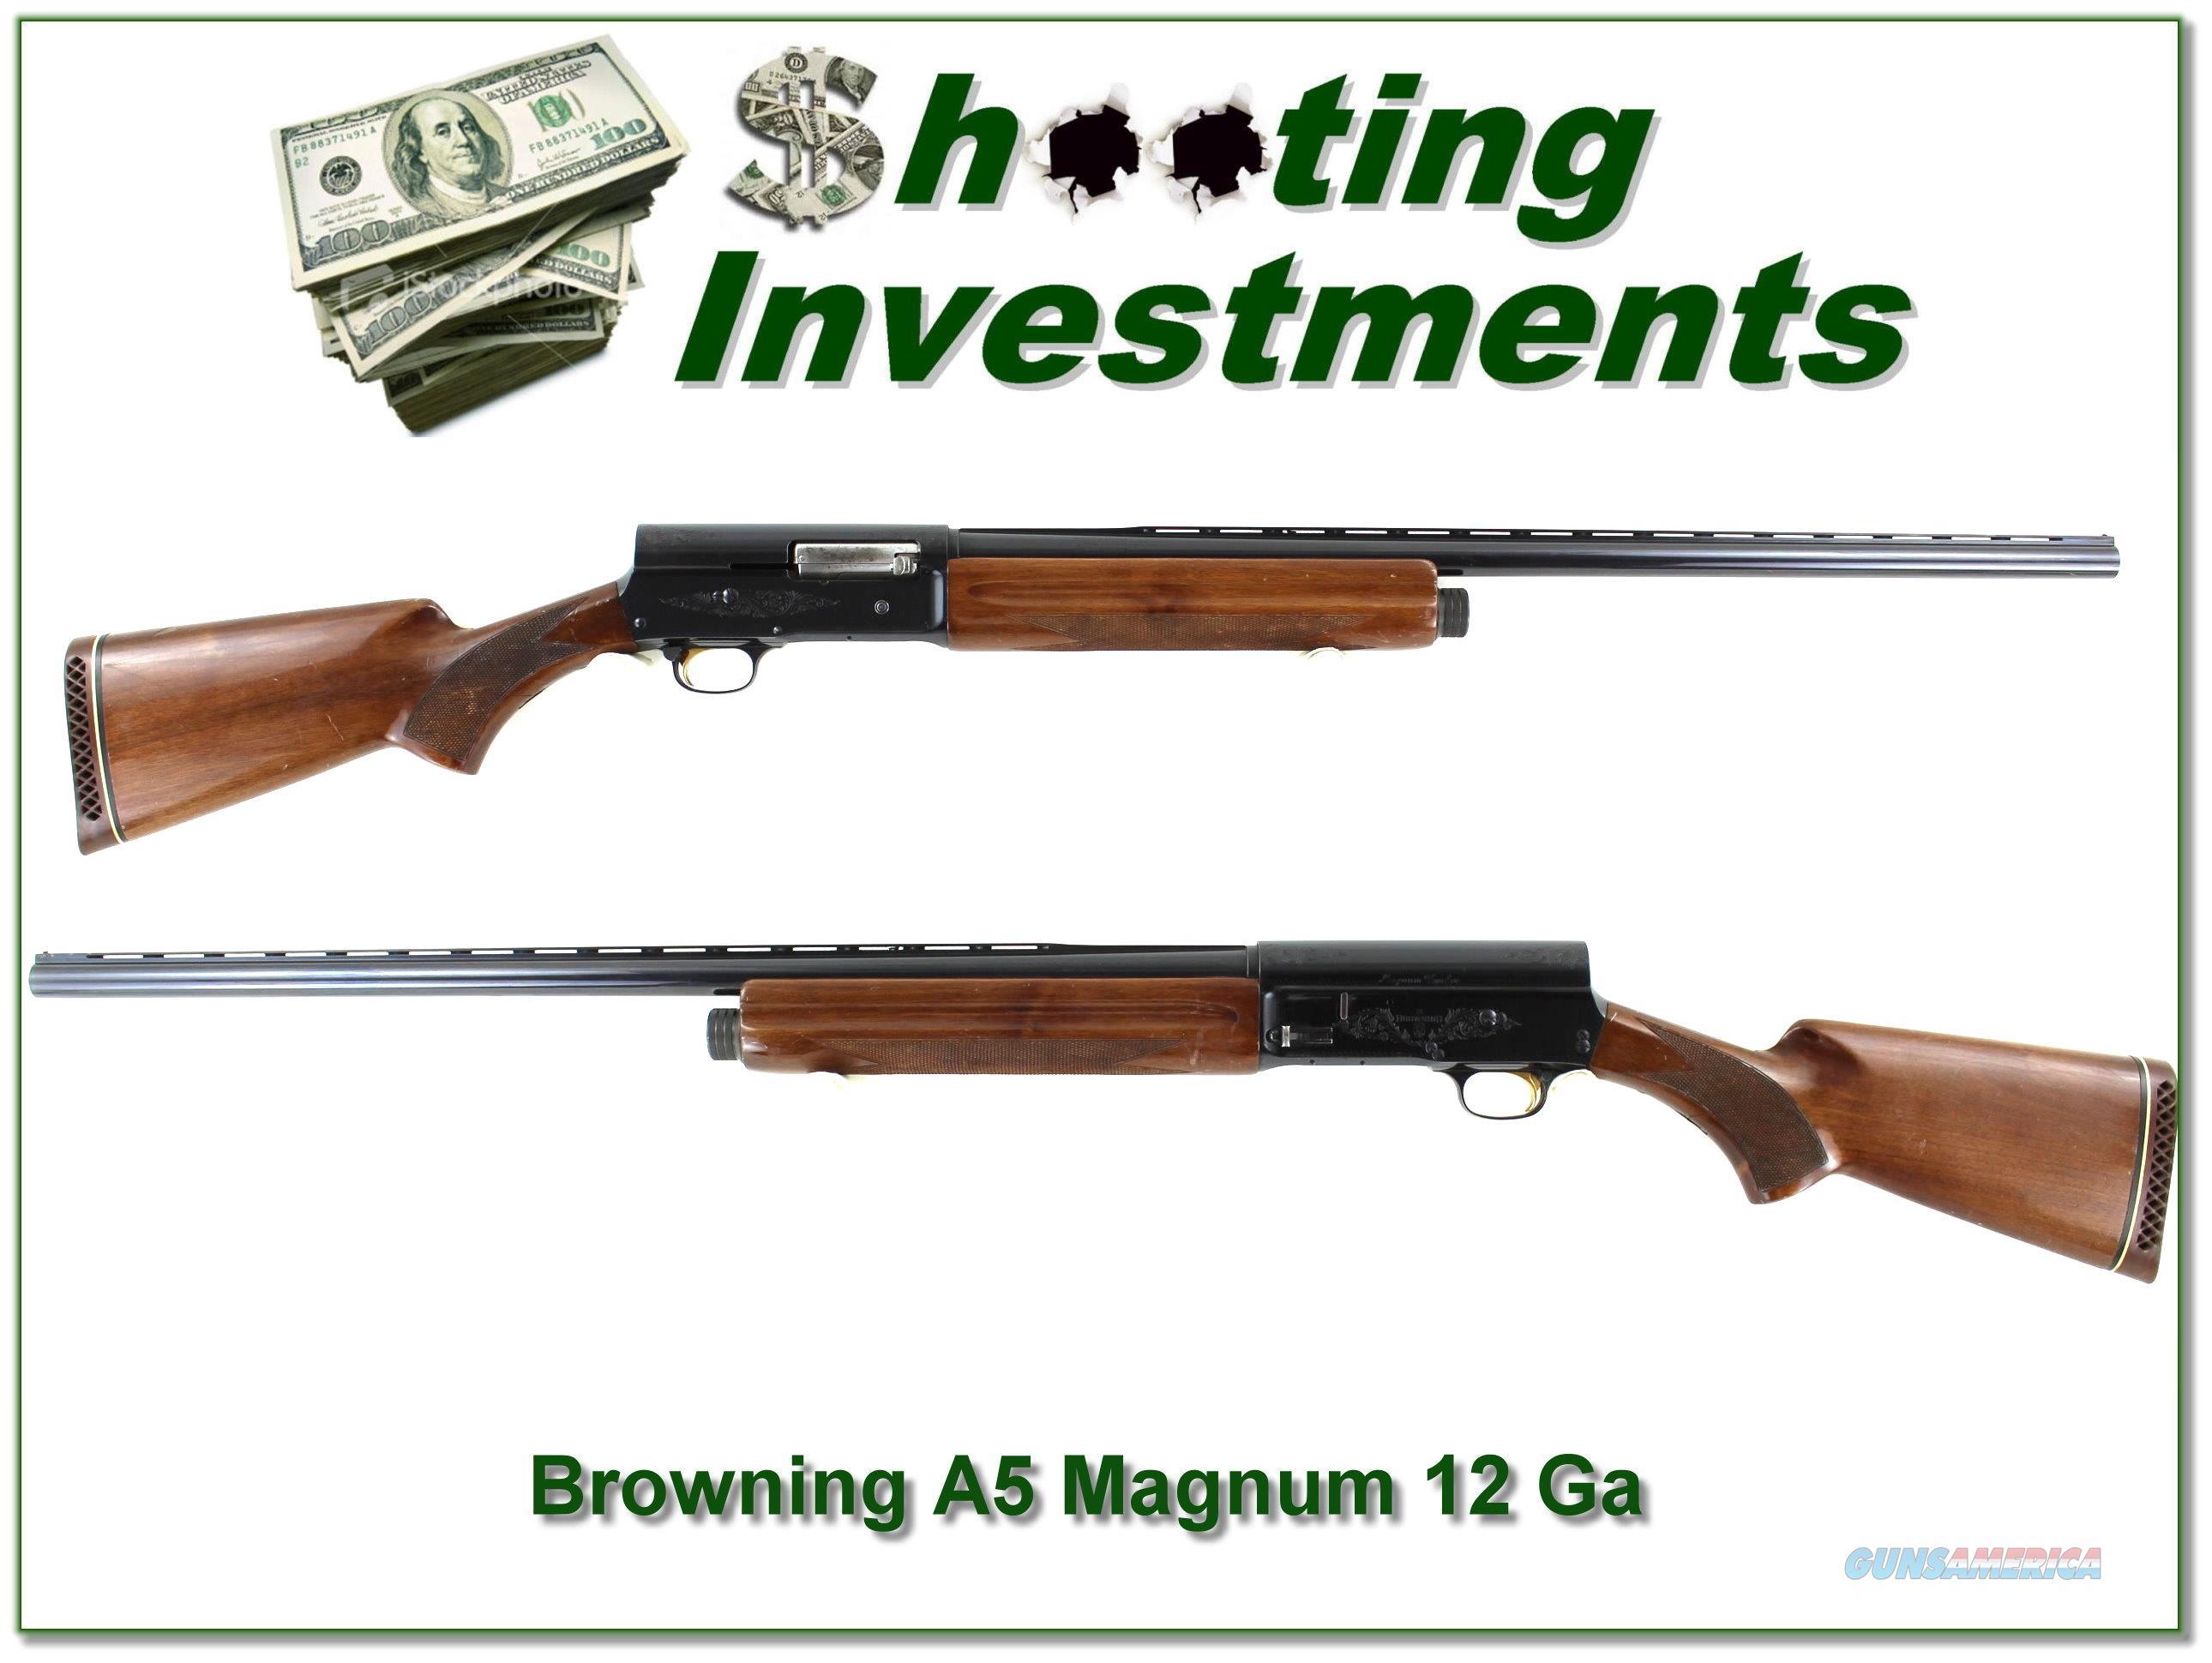 Browning A5 Magnum 12 Gauge 28in VR  Guns > Shotguns > Browning Shotguns > Autoloaders > Hunting